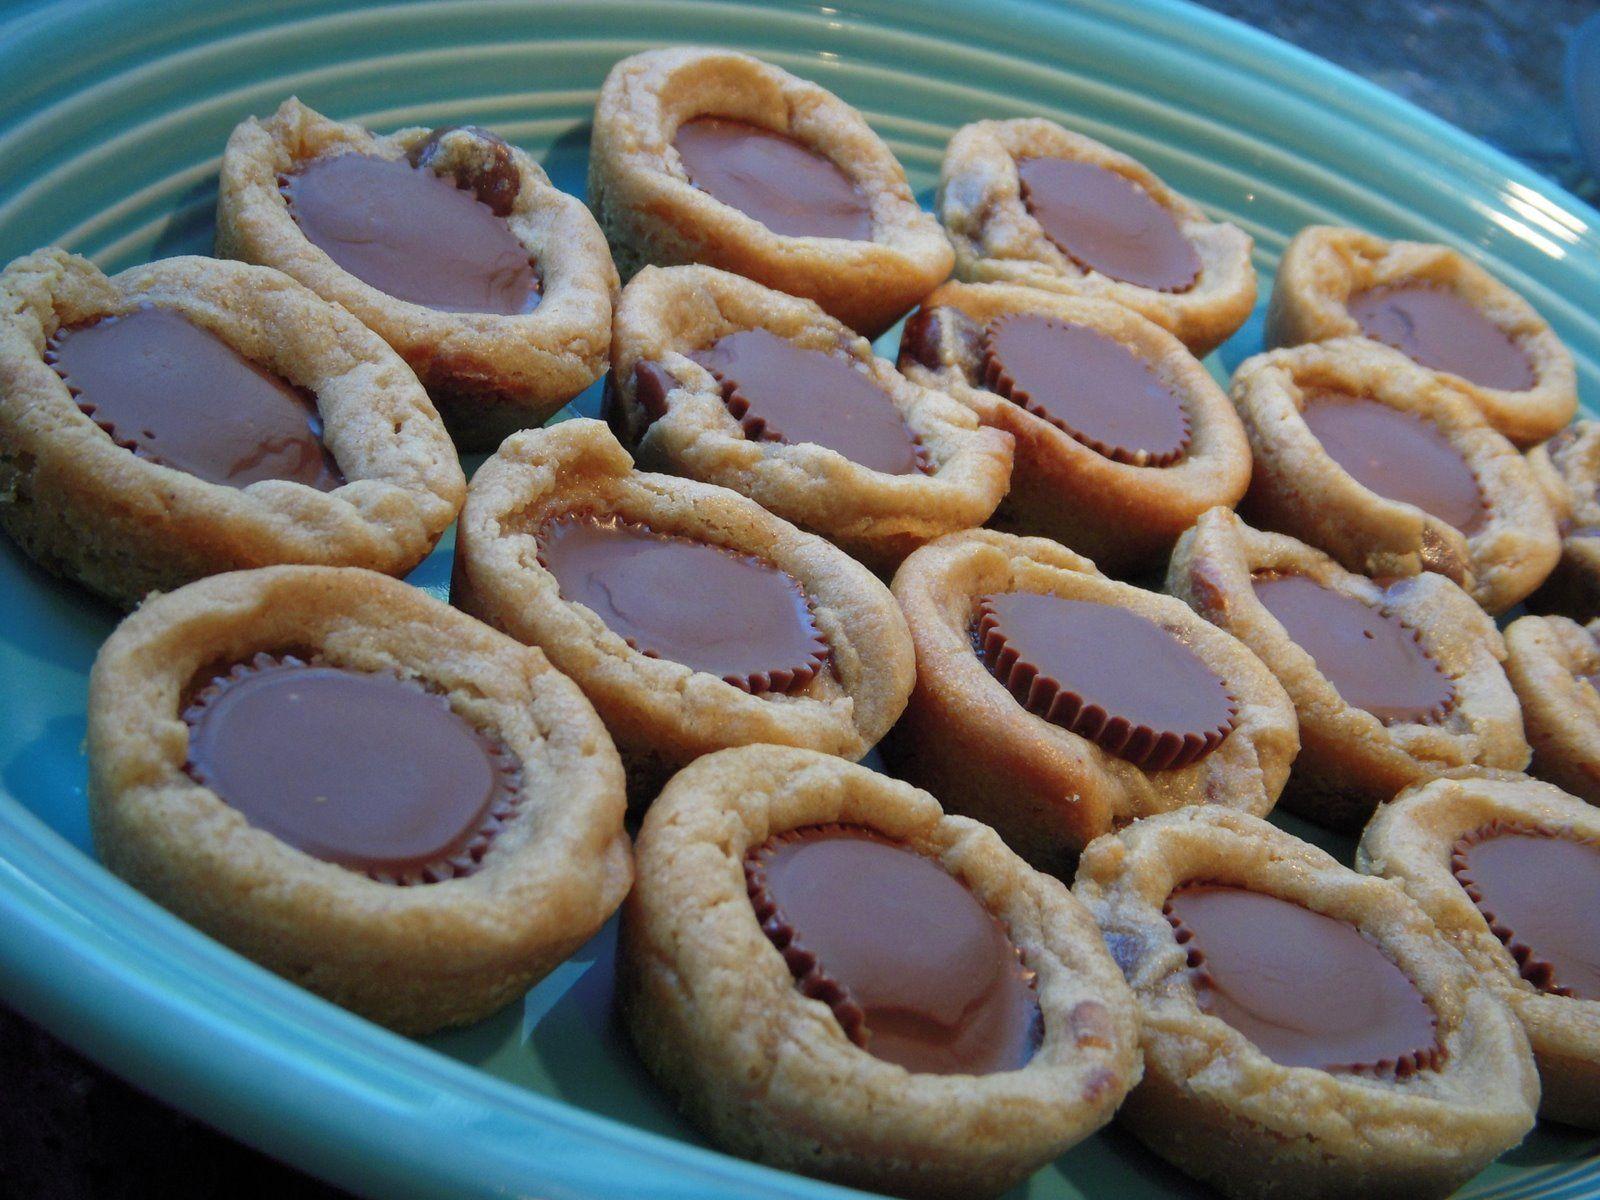 PB Cookie Dough for 12...break in half...bake 5 min less than package...press Resse's Mini's inside.